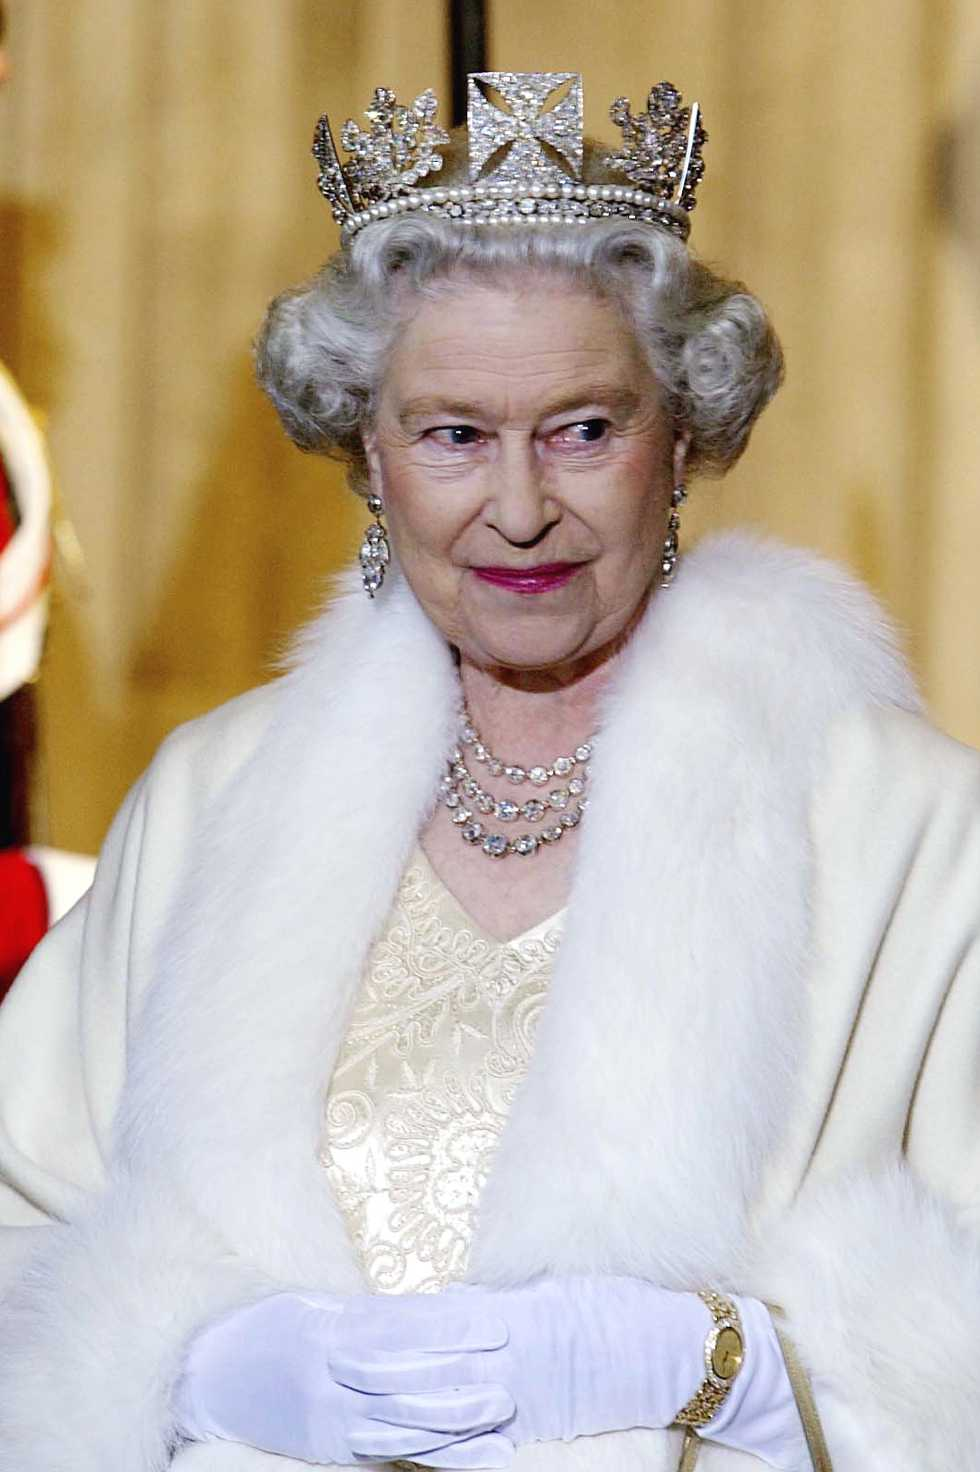 Queen Elizabeth Wore the Vladimir Tiara With Emeralds to